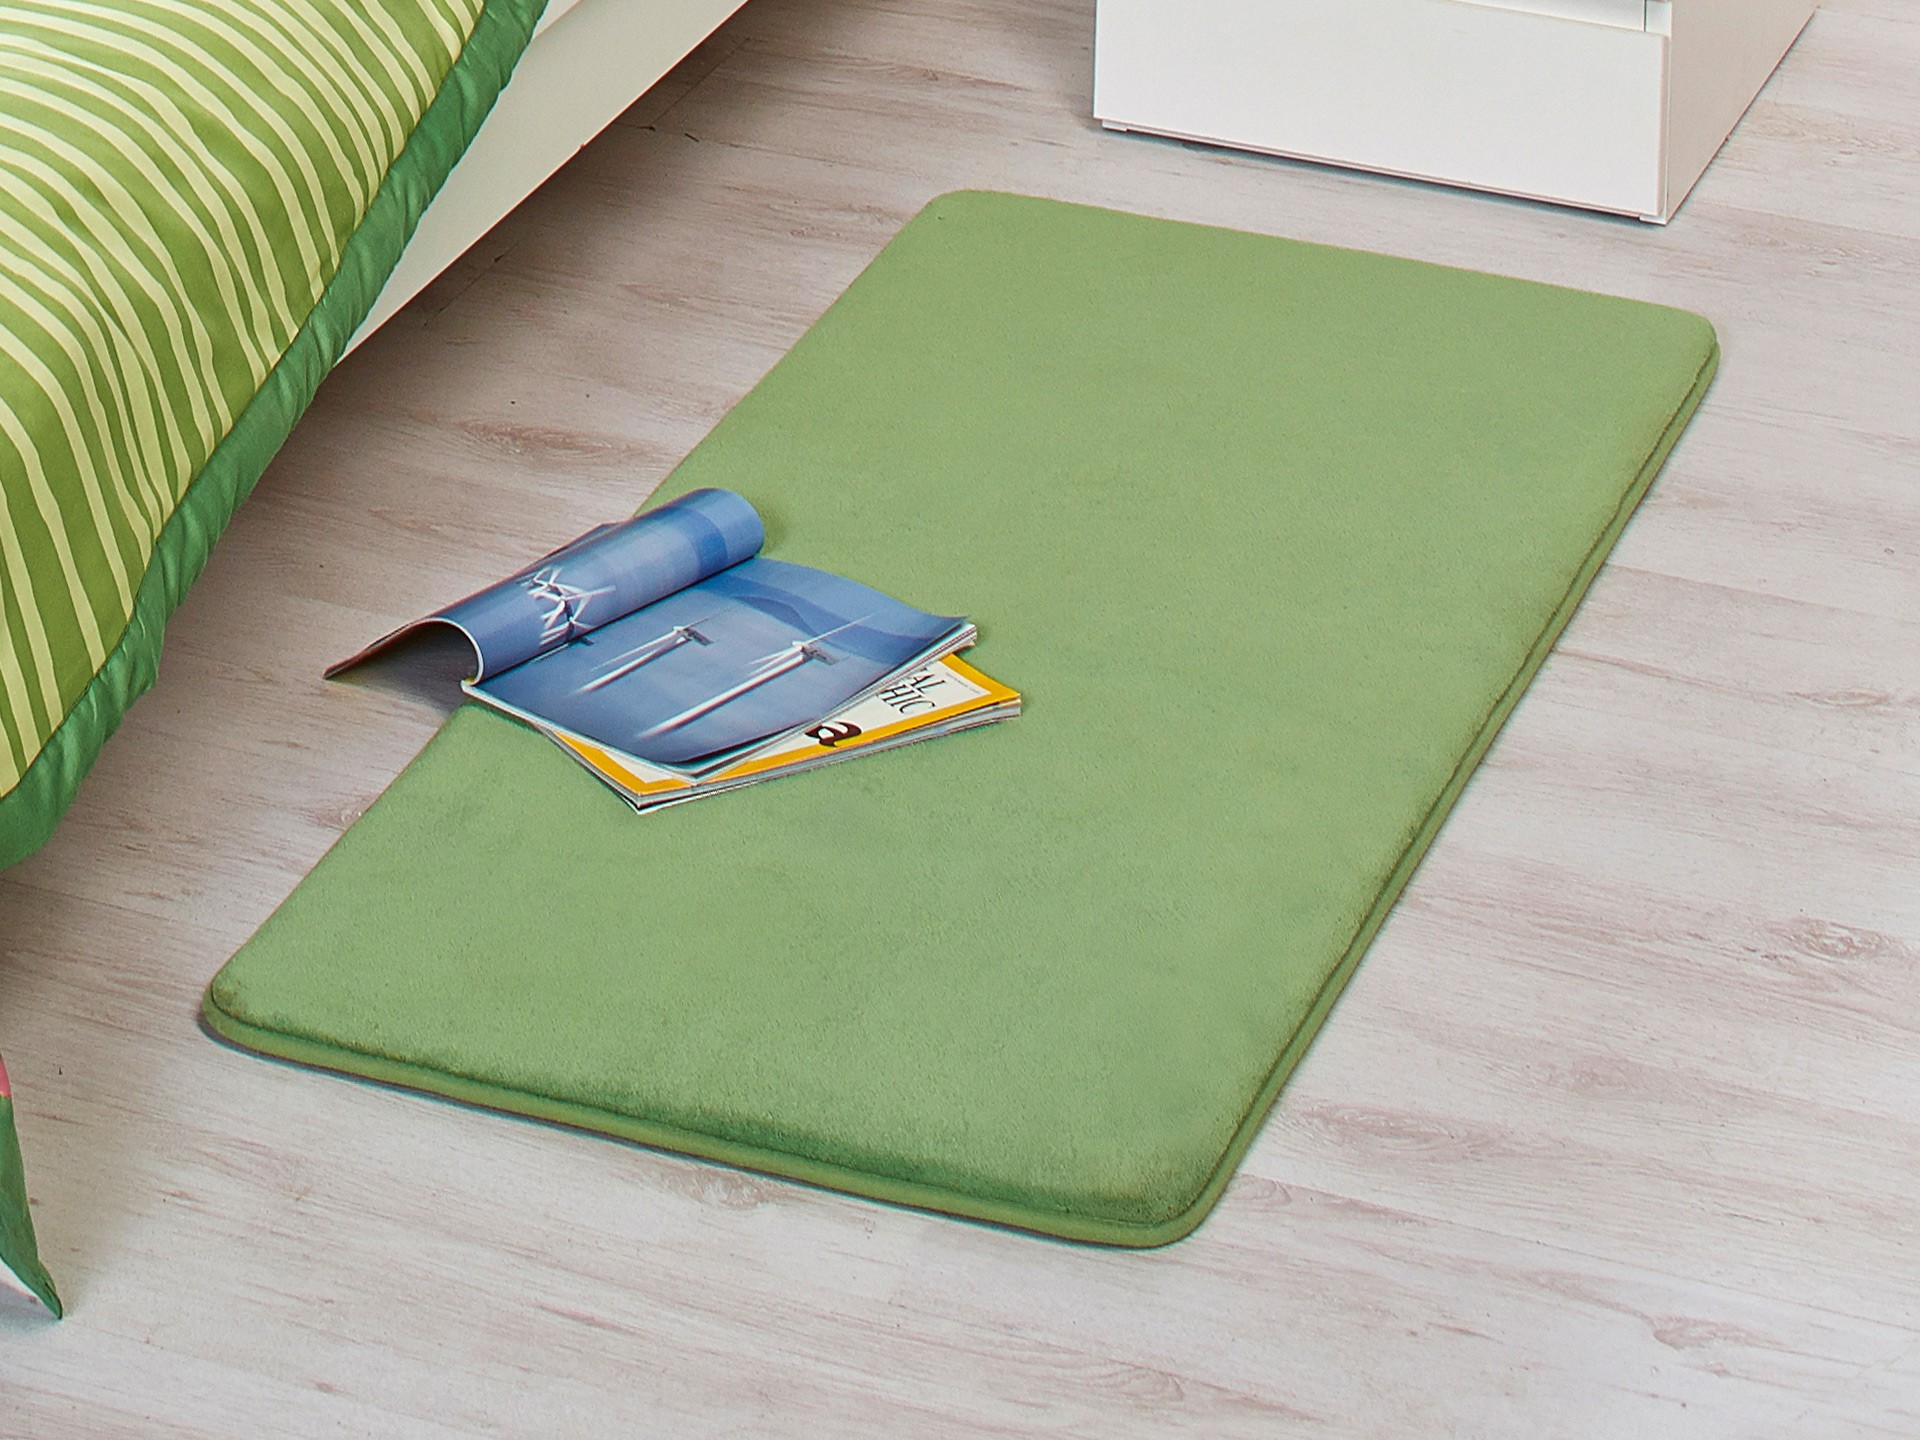 Verde Килим (піна з пам'яттю)